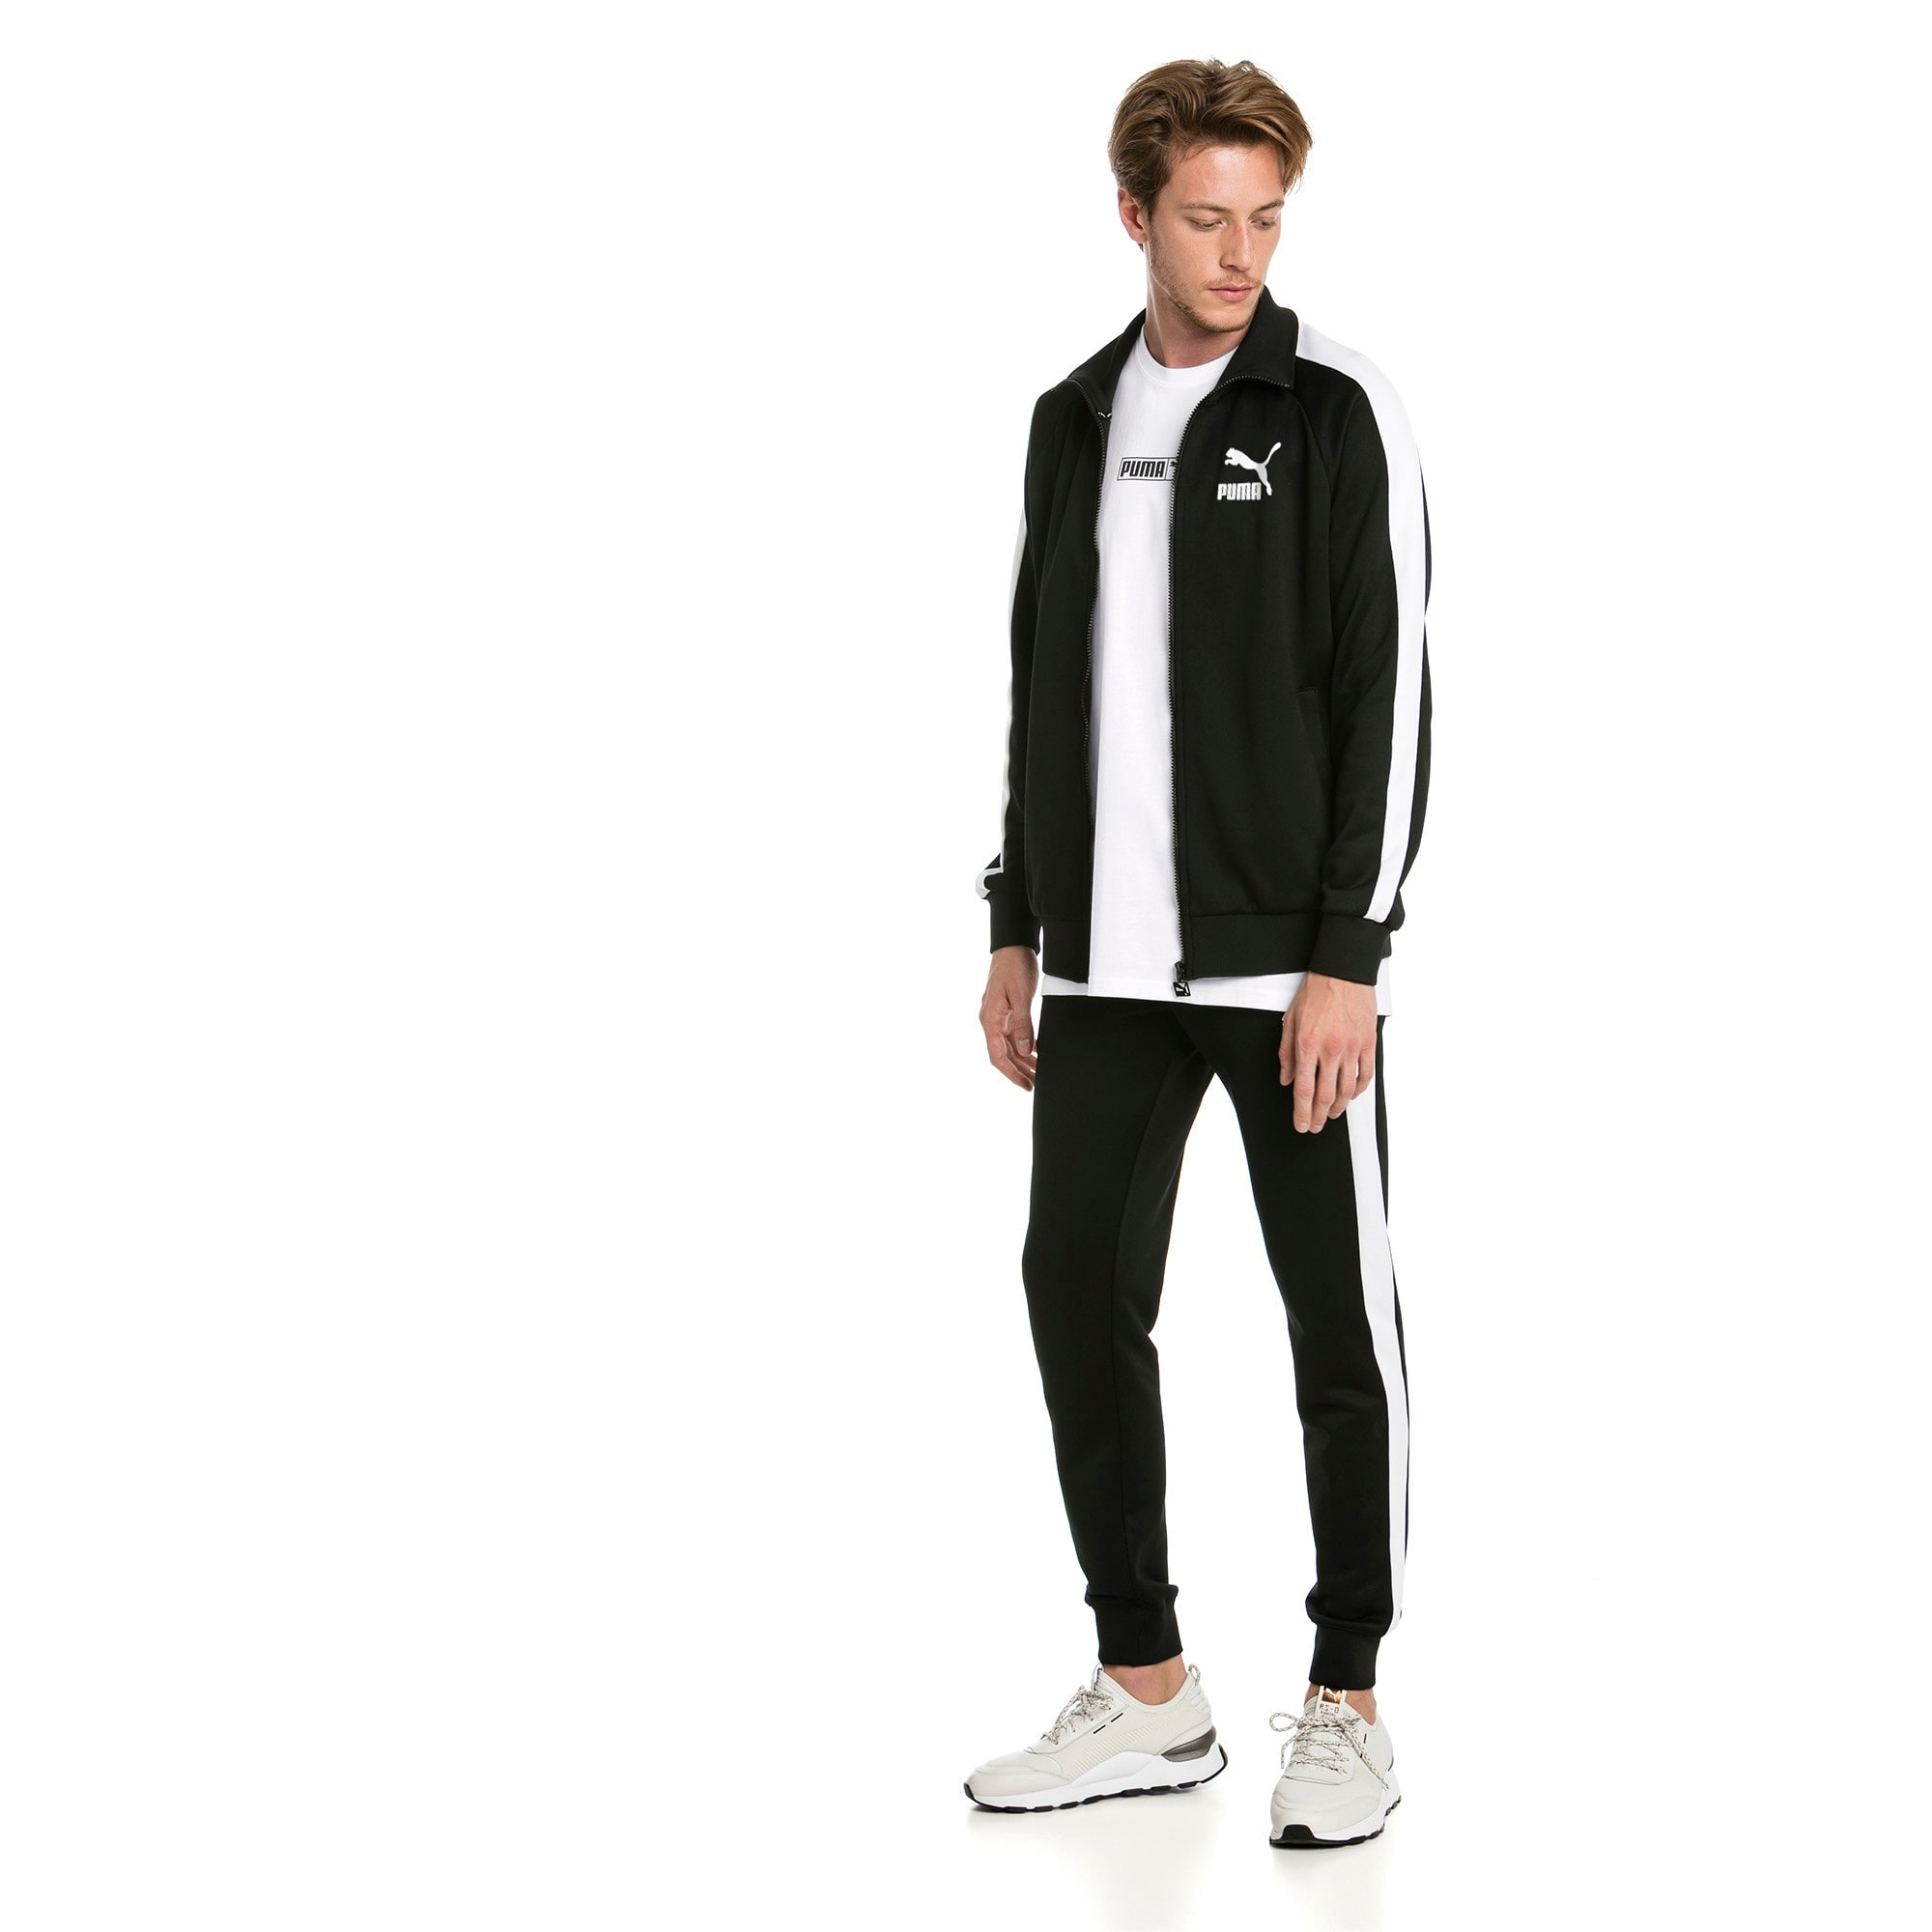 Thumbnail 3 of Iconic T7 Herren Gestrickte Sweatpants, Puma Black, medium